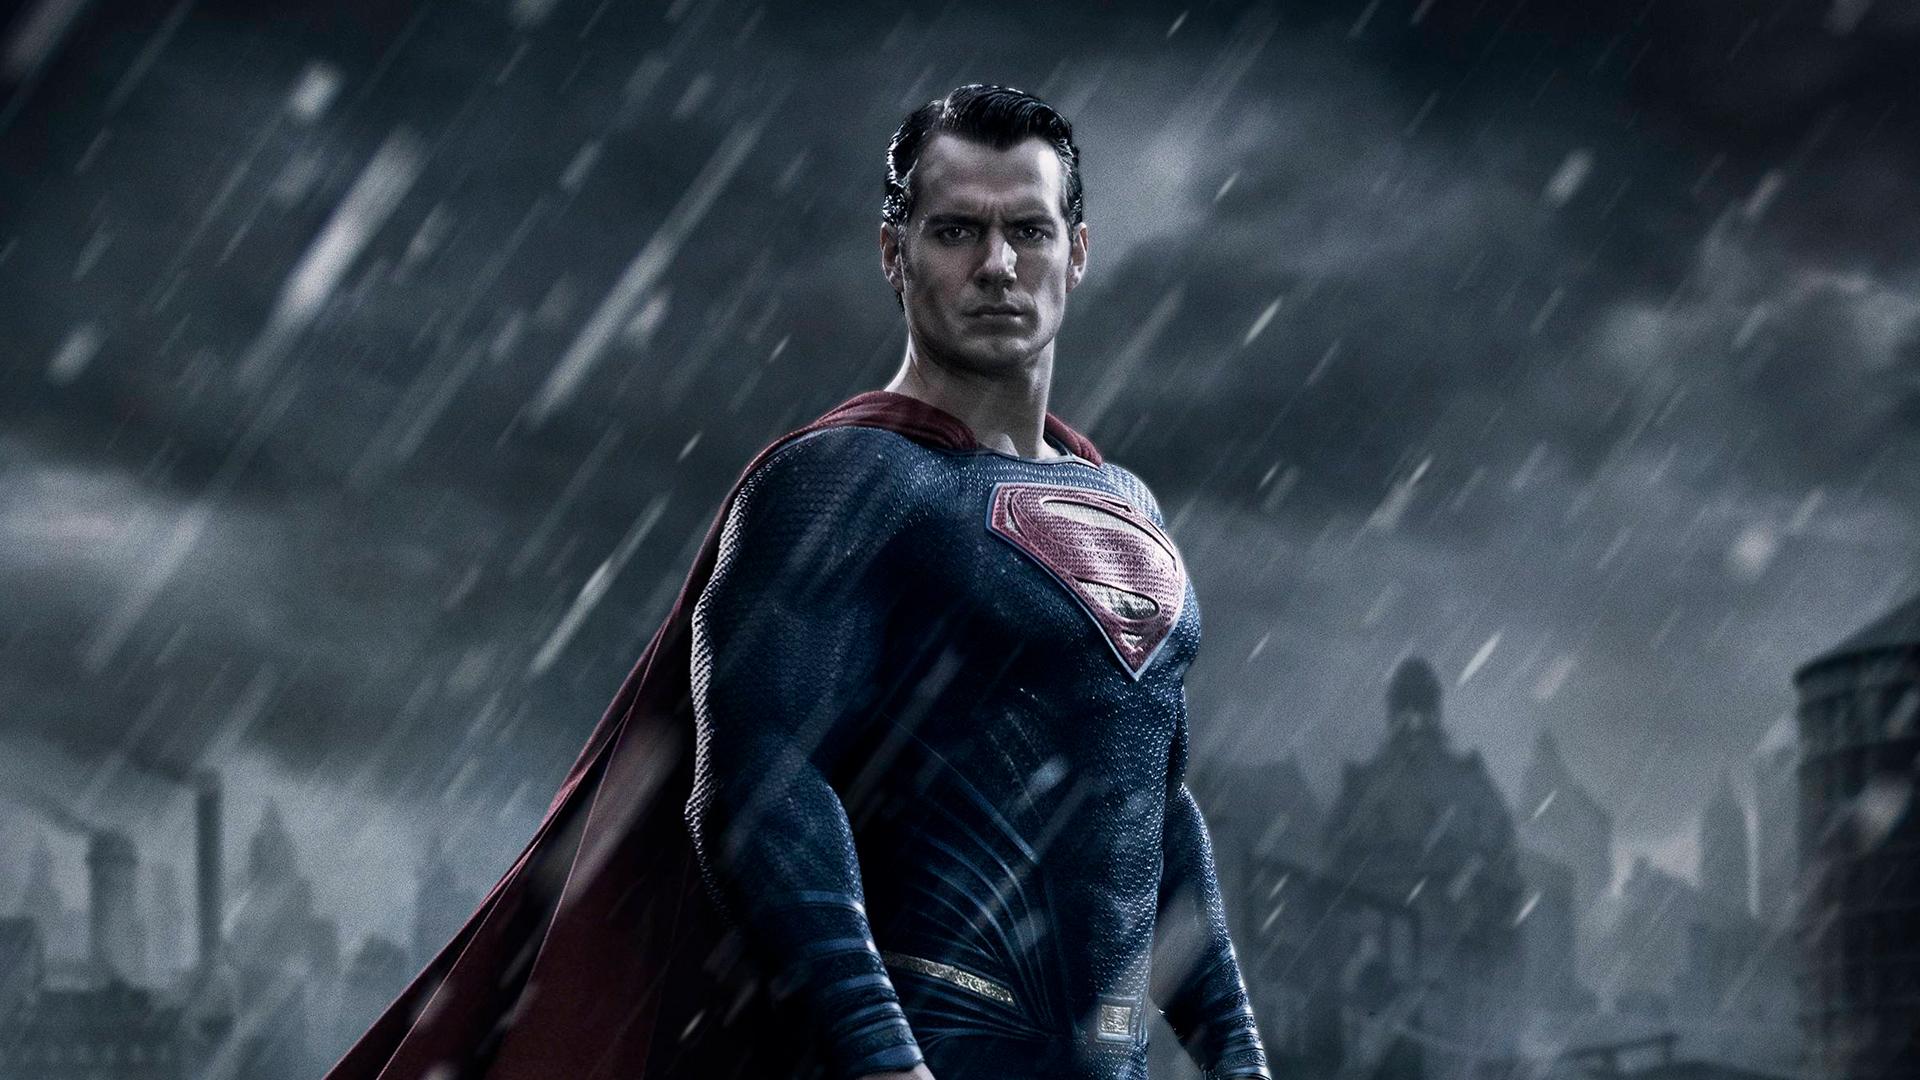 Batman V Superman Dawn Of Justice Wallpaper By Sachso74 On Deviantart